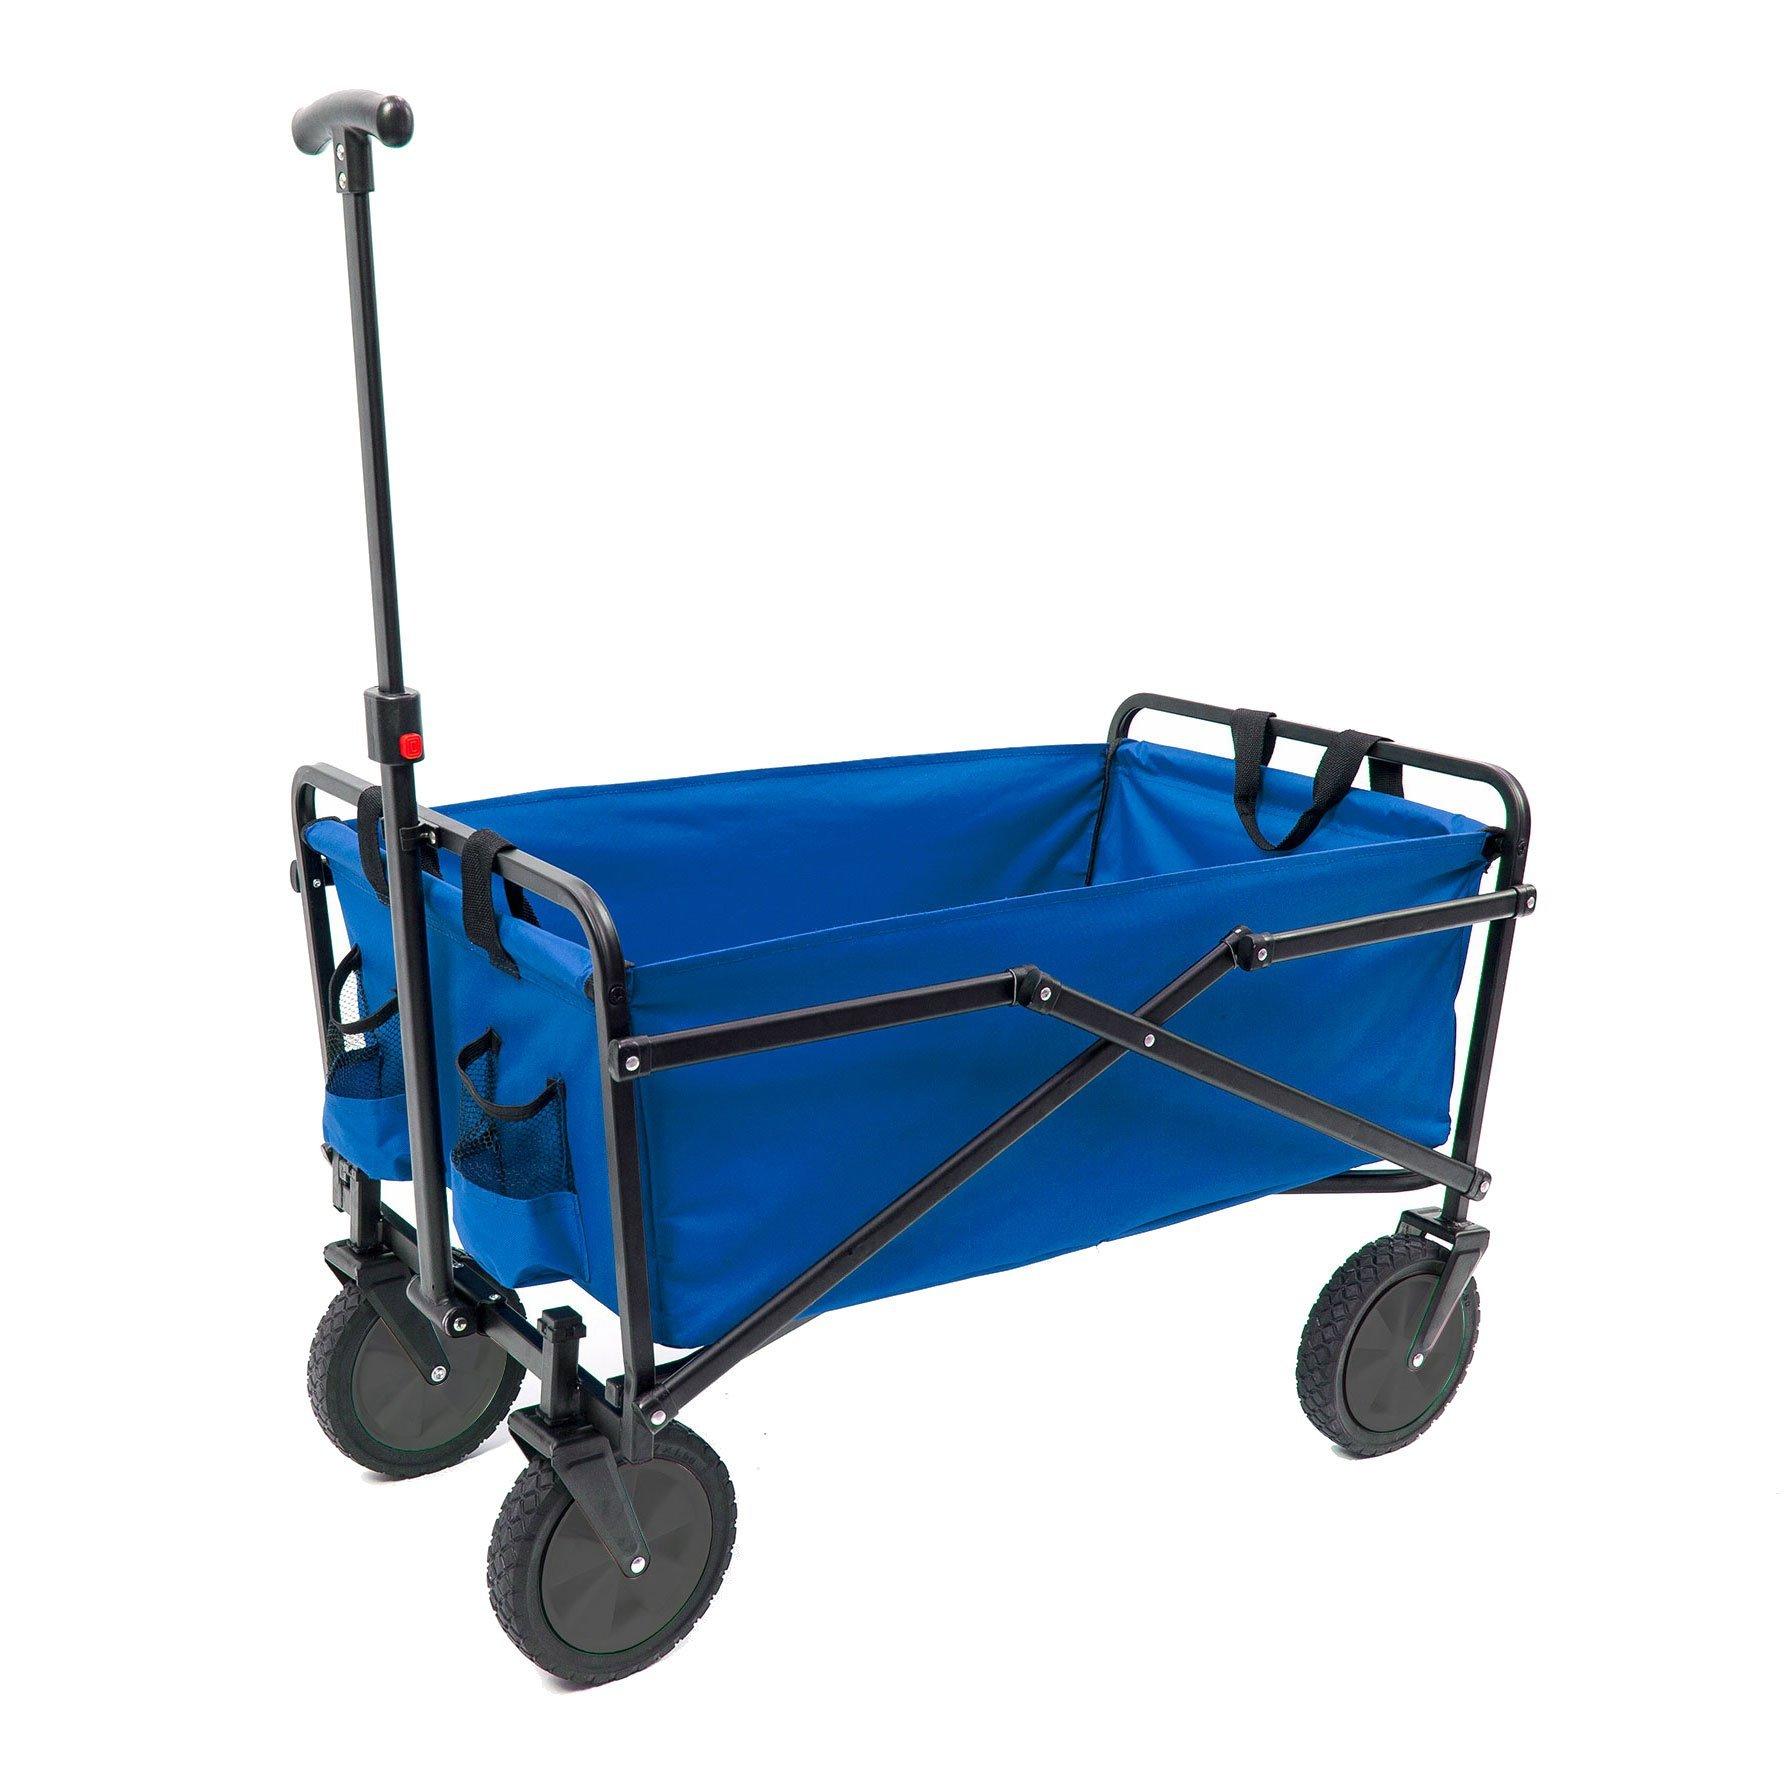 Seina Compact Folding 225-Pound Capacity Utility Cart, Blue